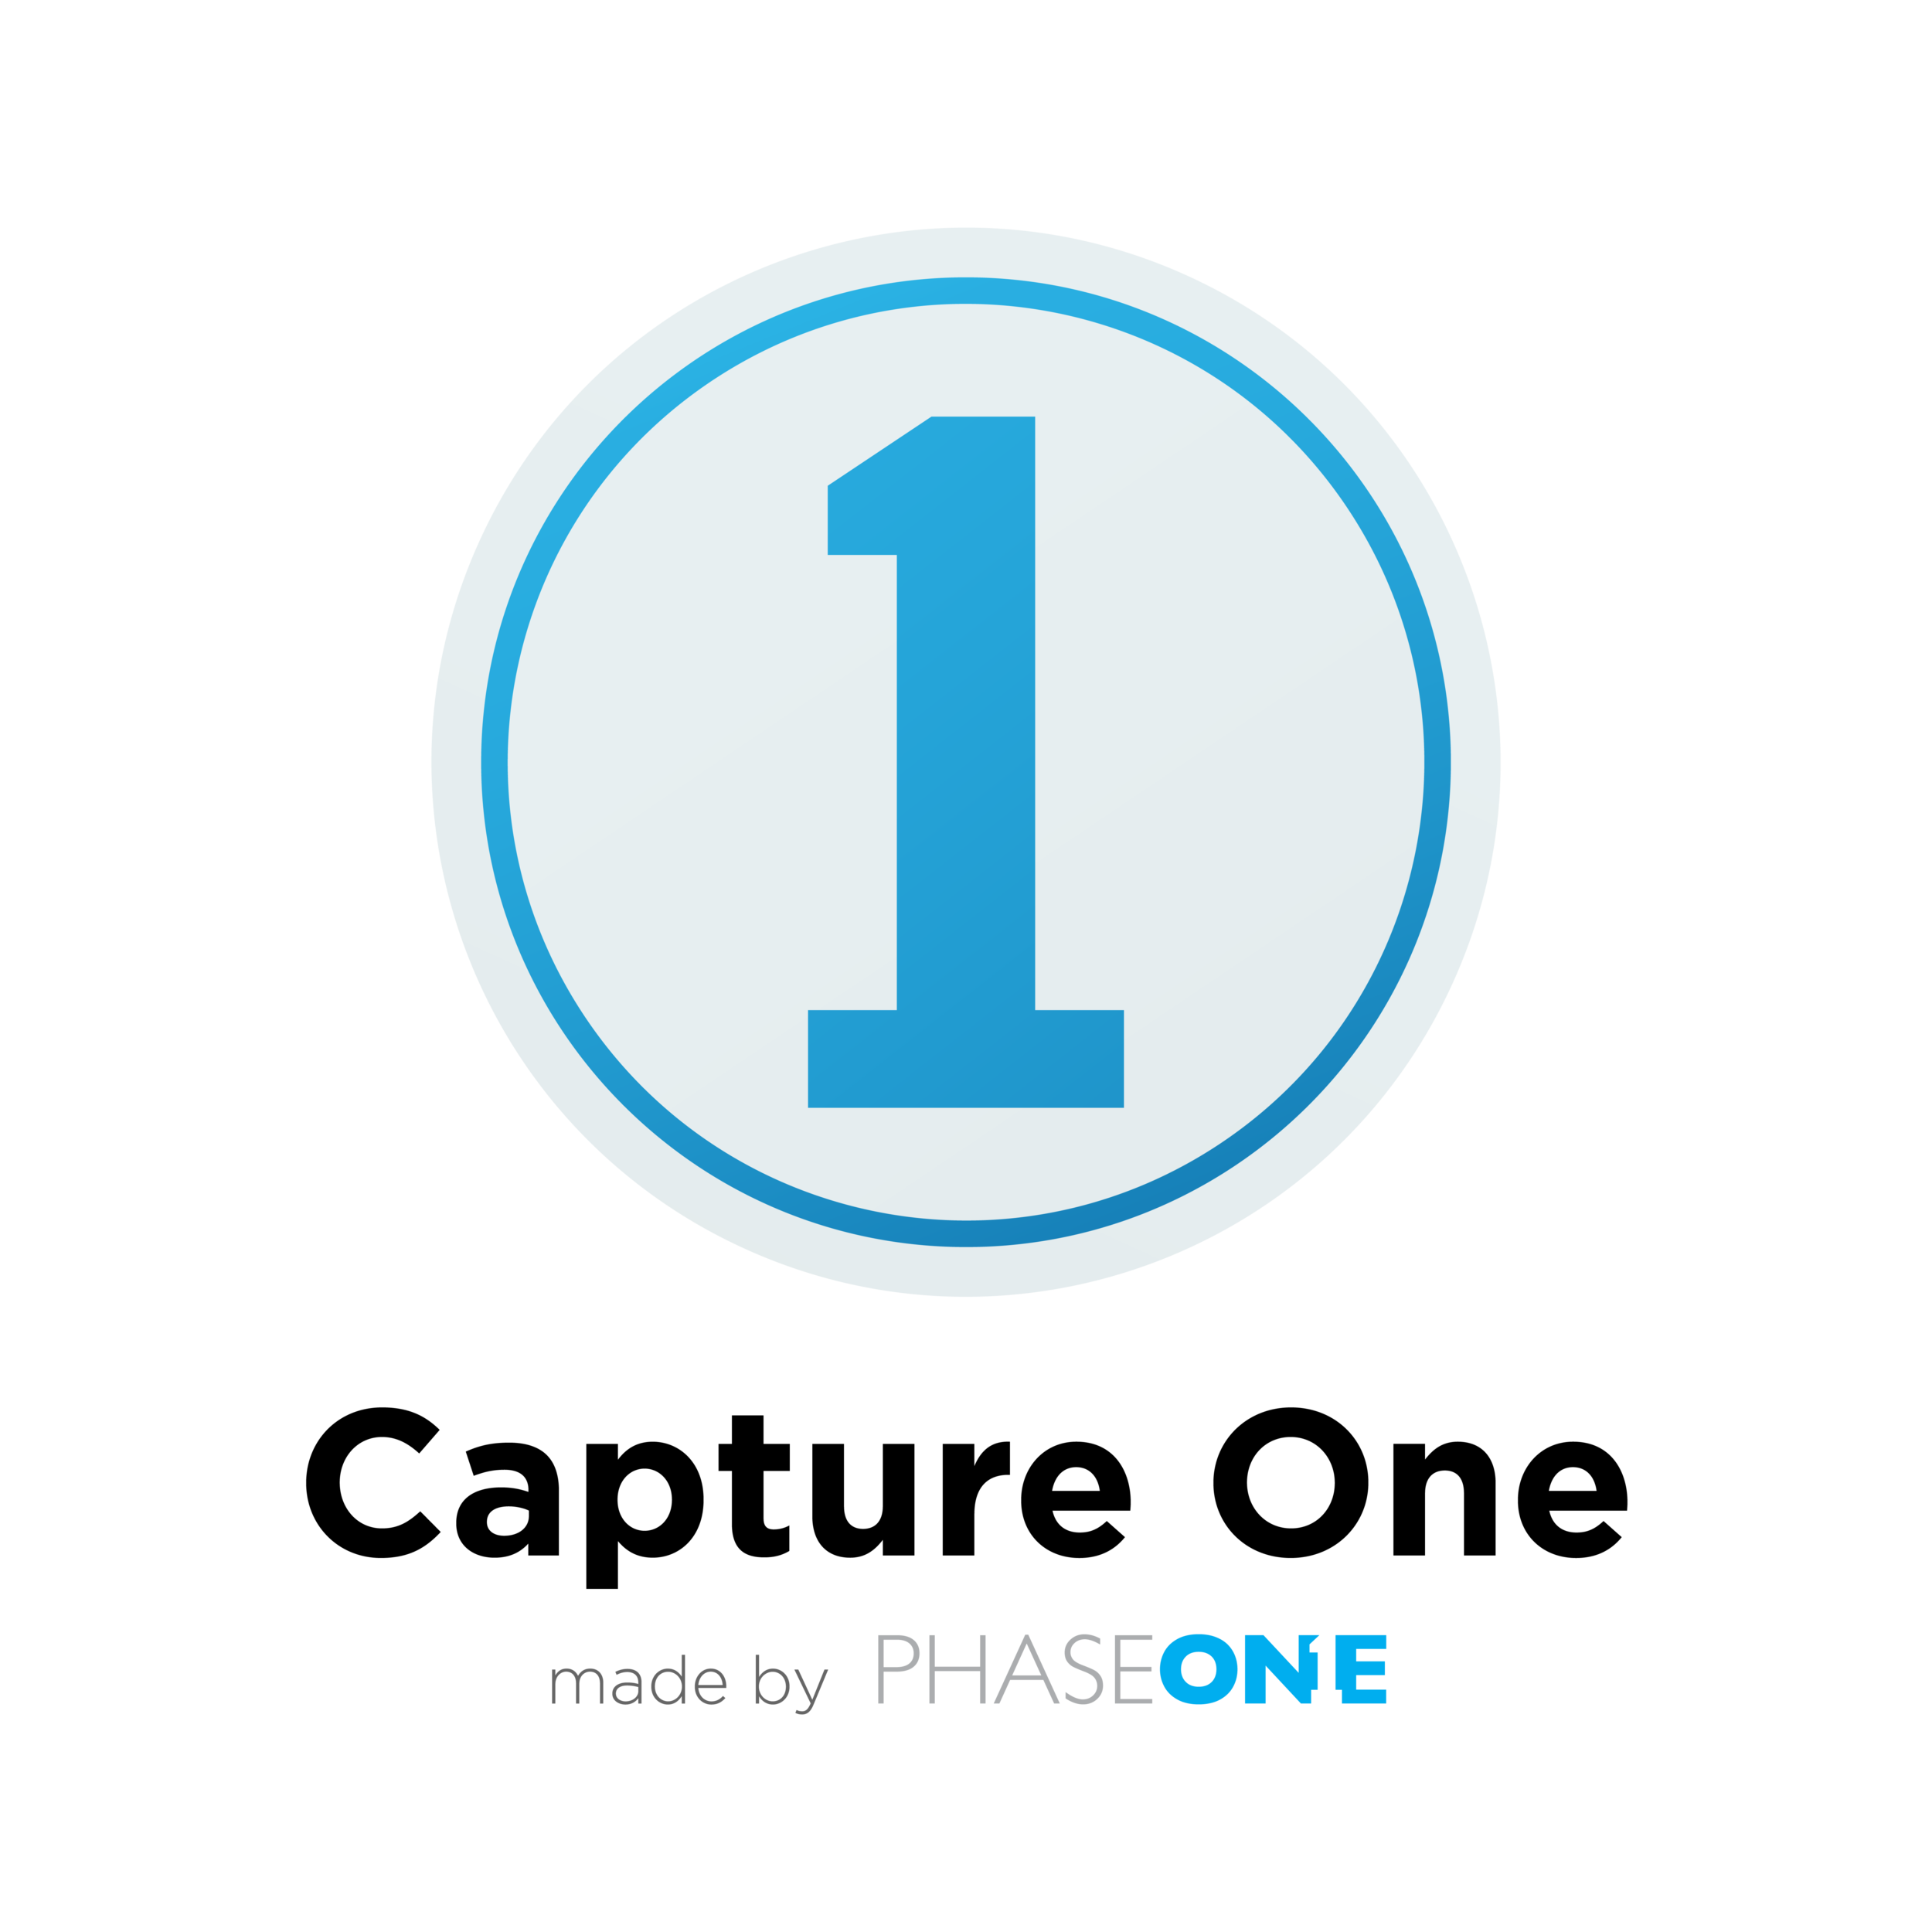 C1 logo 1A.png